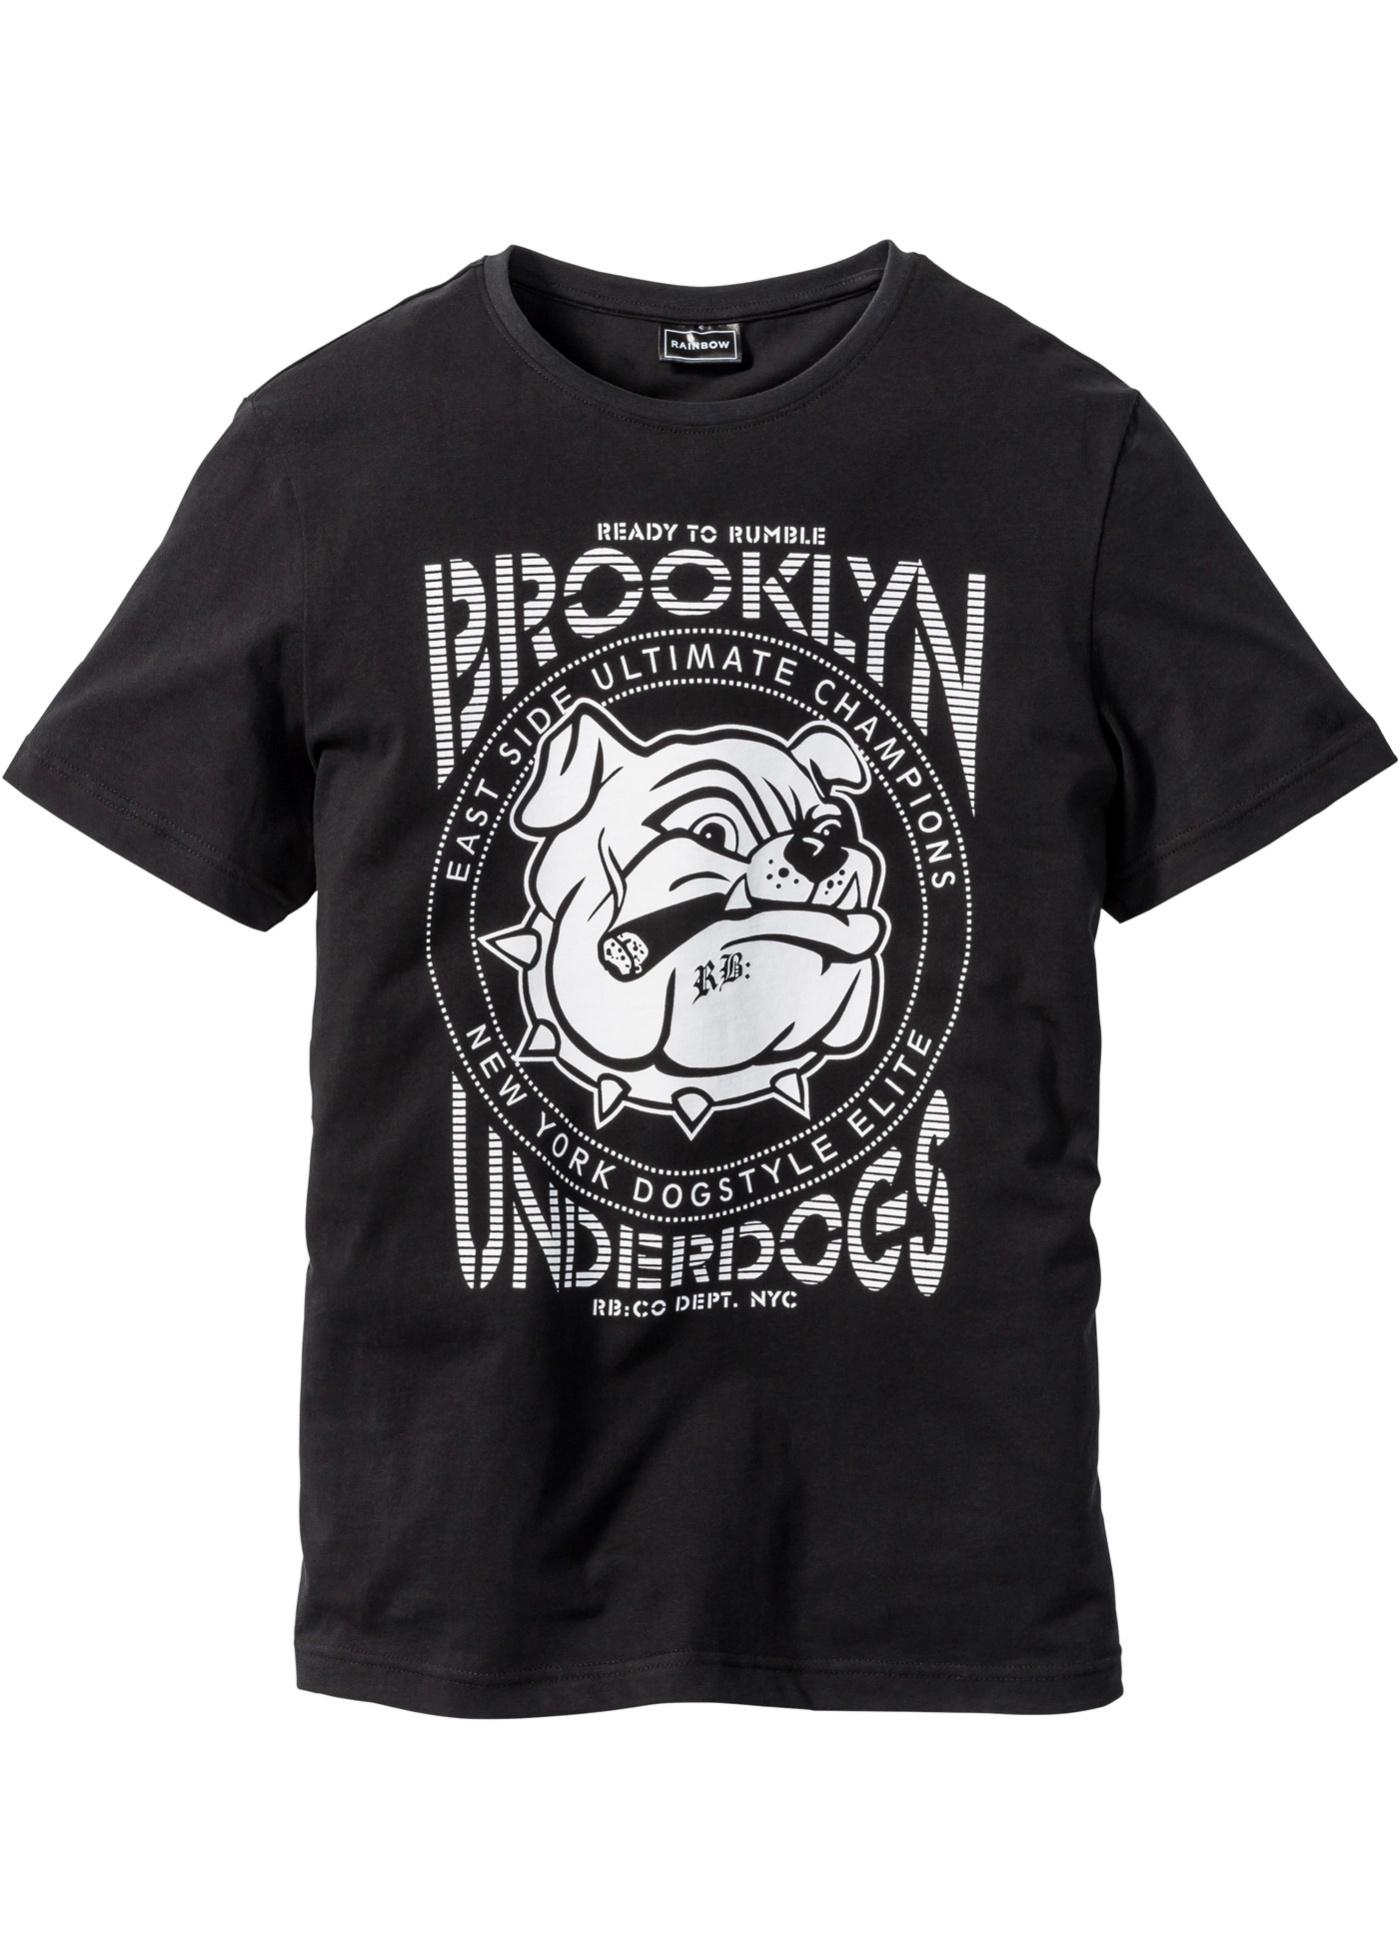 Bonprix - T-shirt 129.00